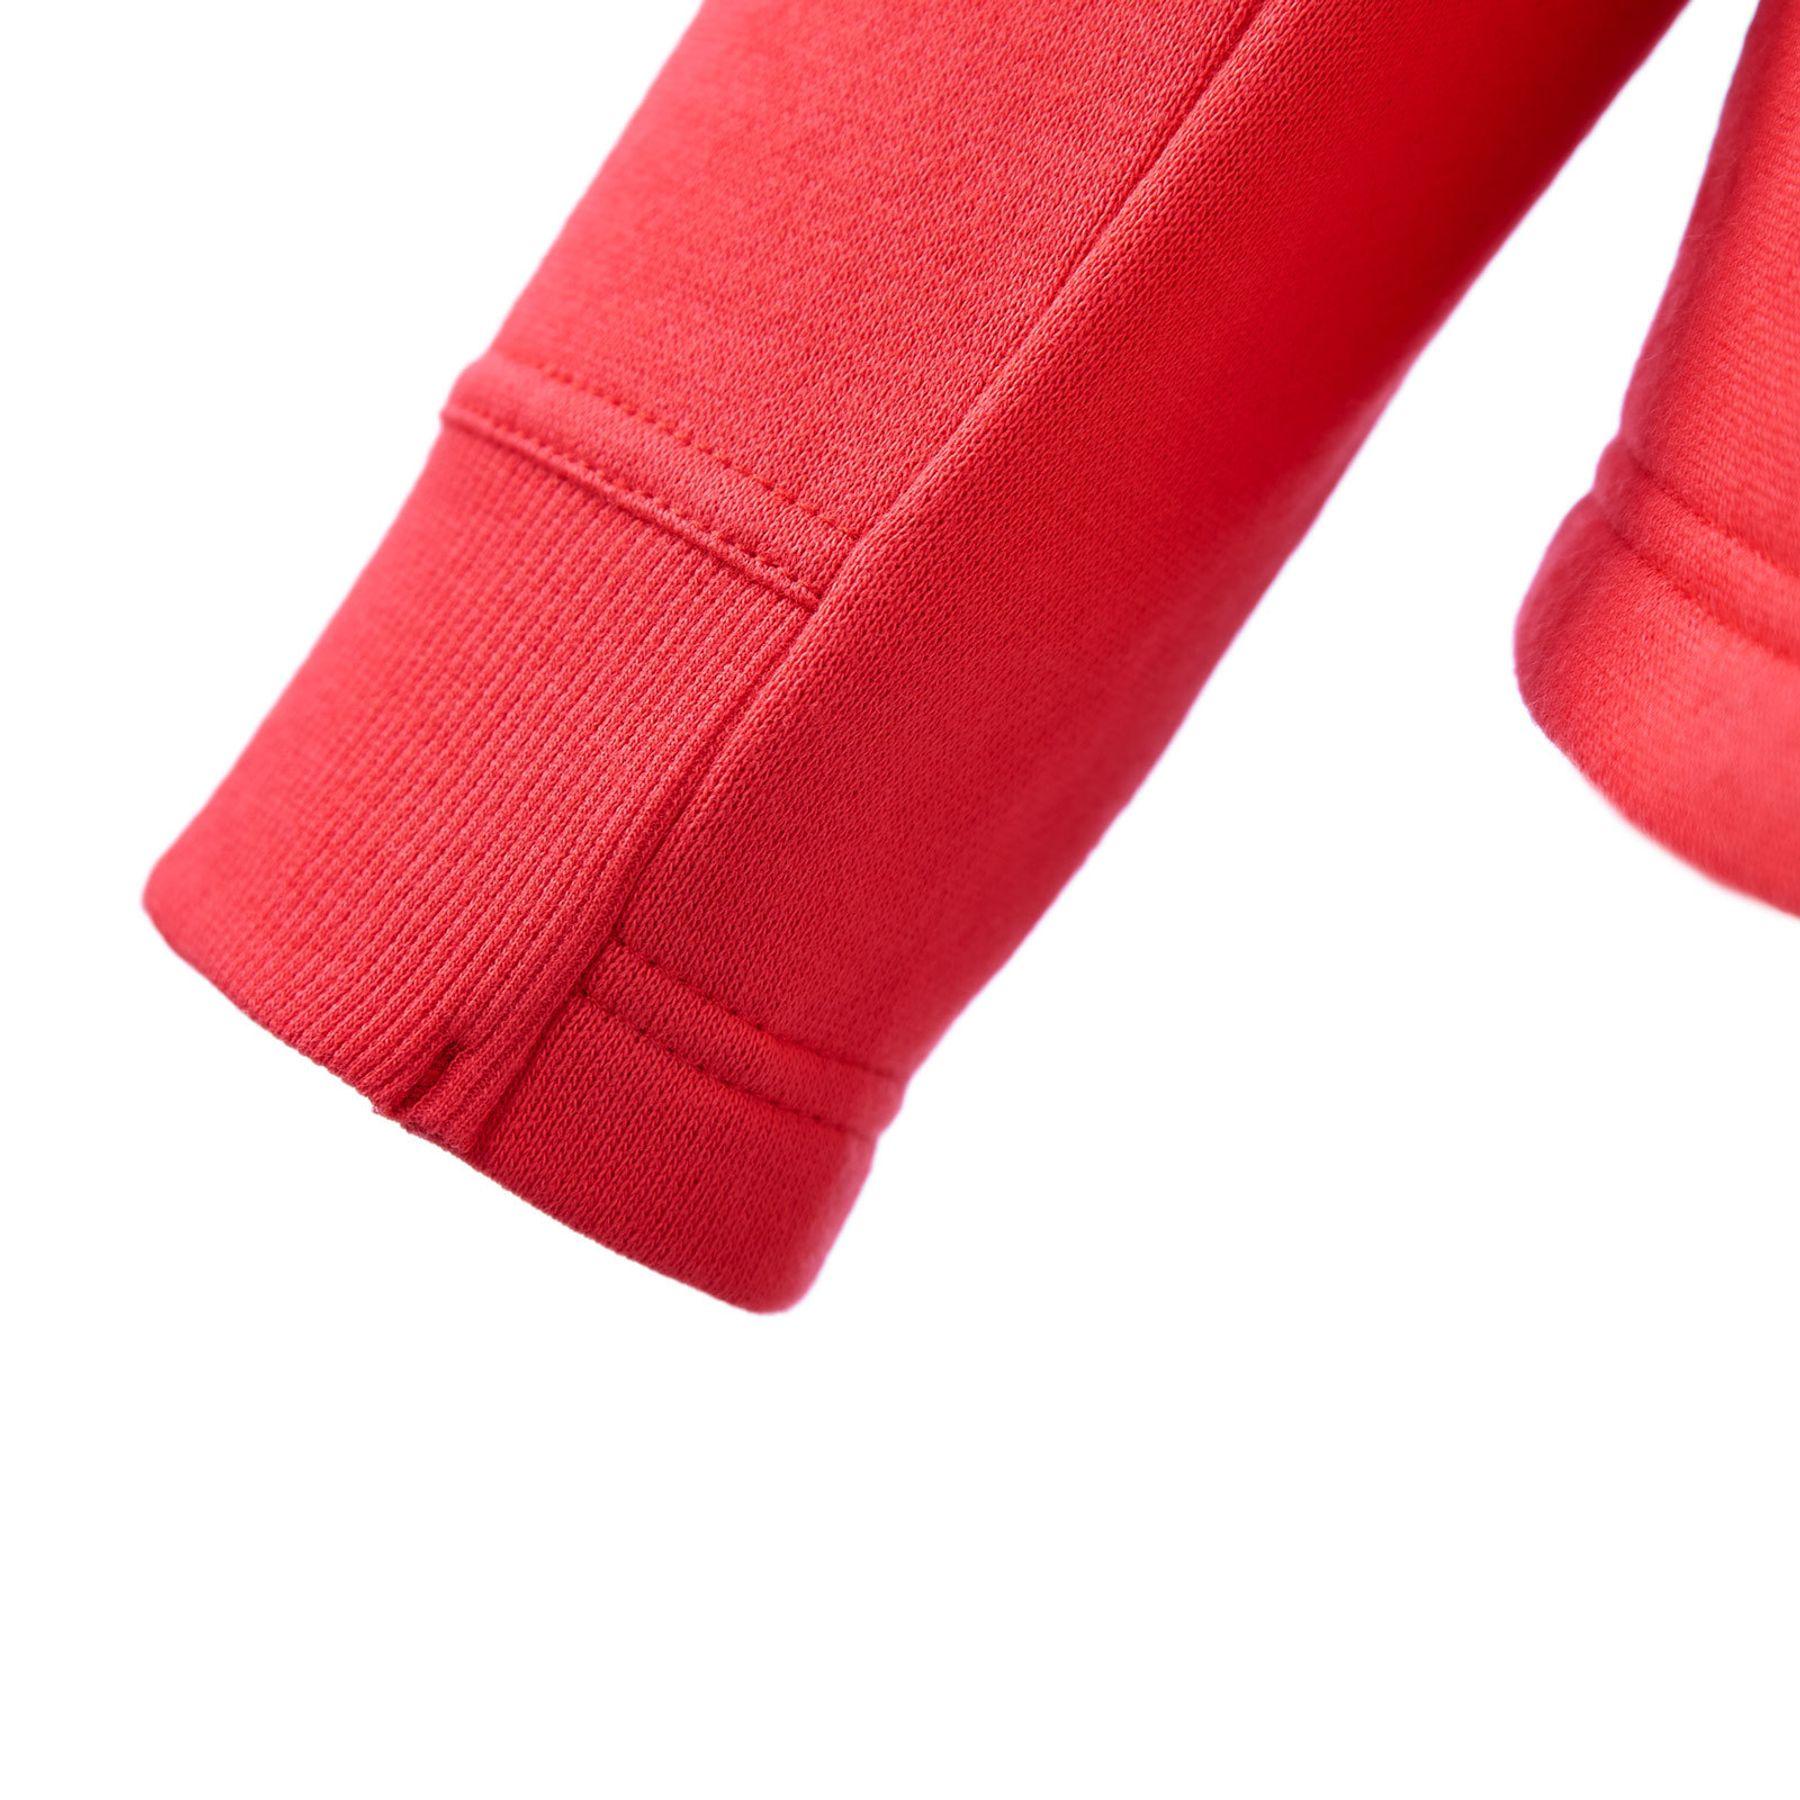 Joy - Damen Sport und Freizeit Jacke in mehreren Farben, Paulina (34500) – Bild 24